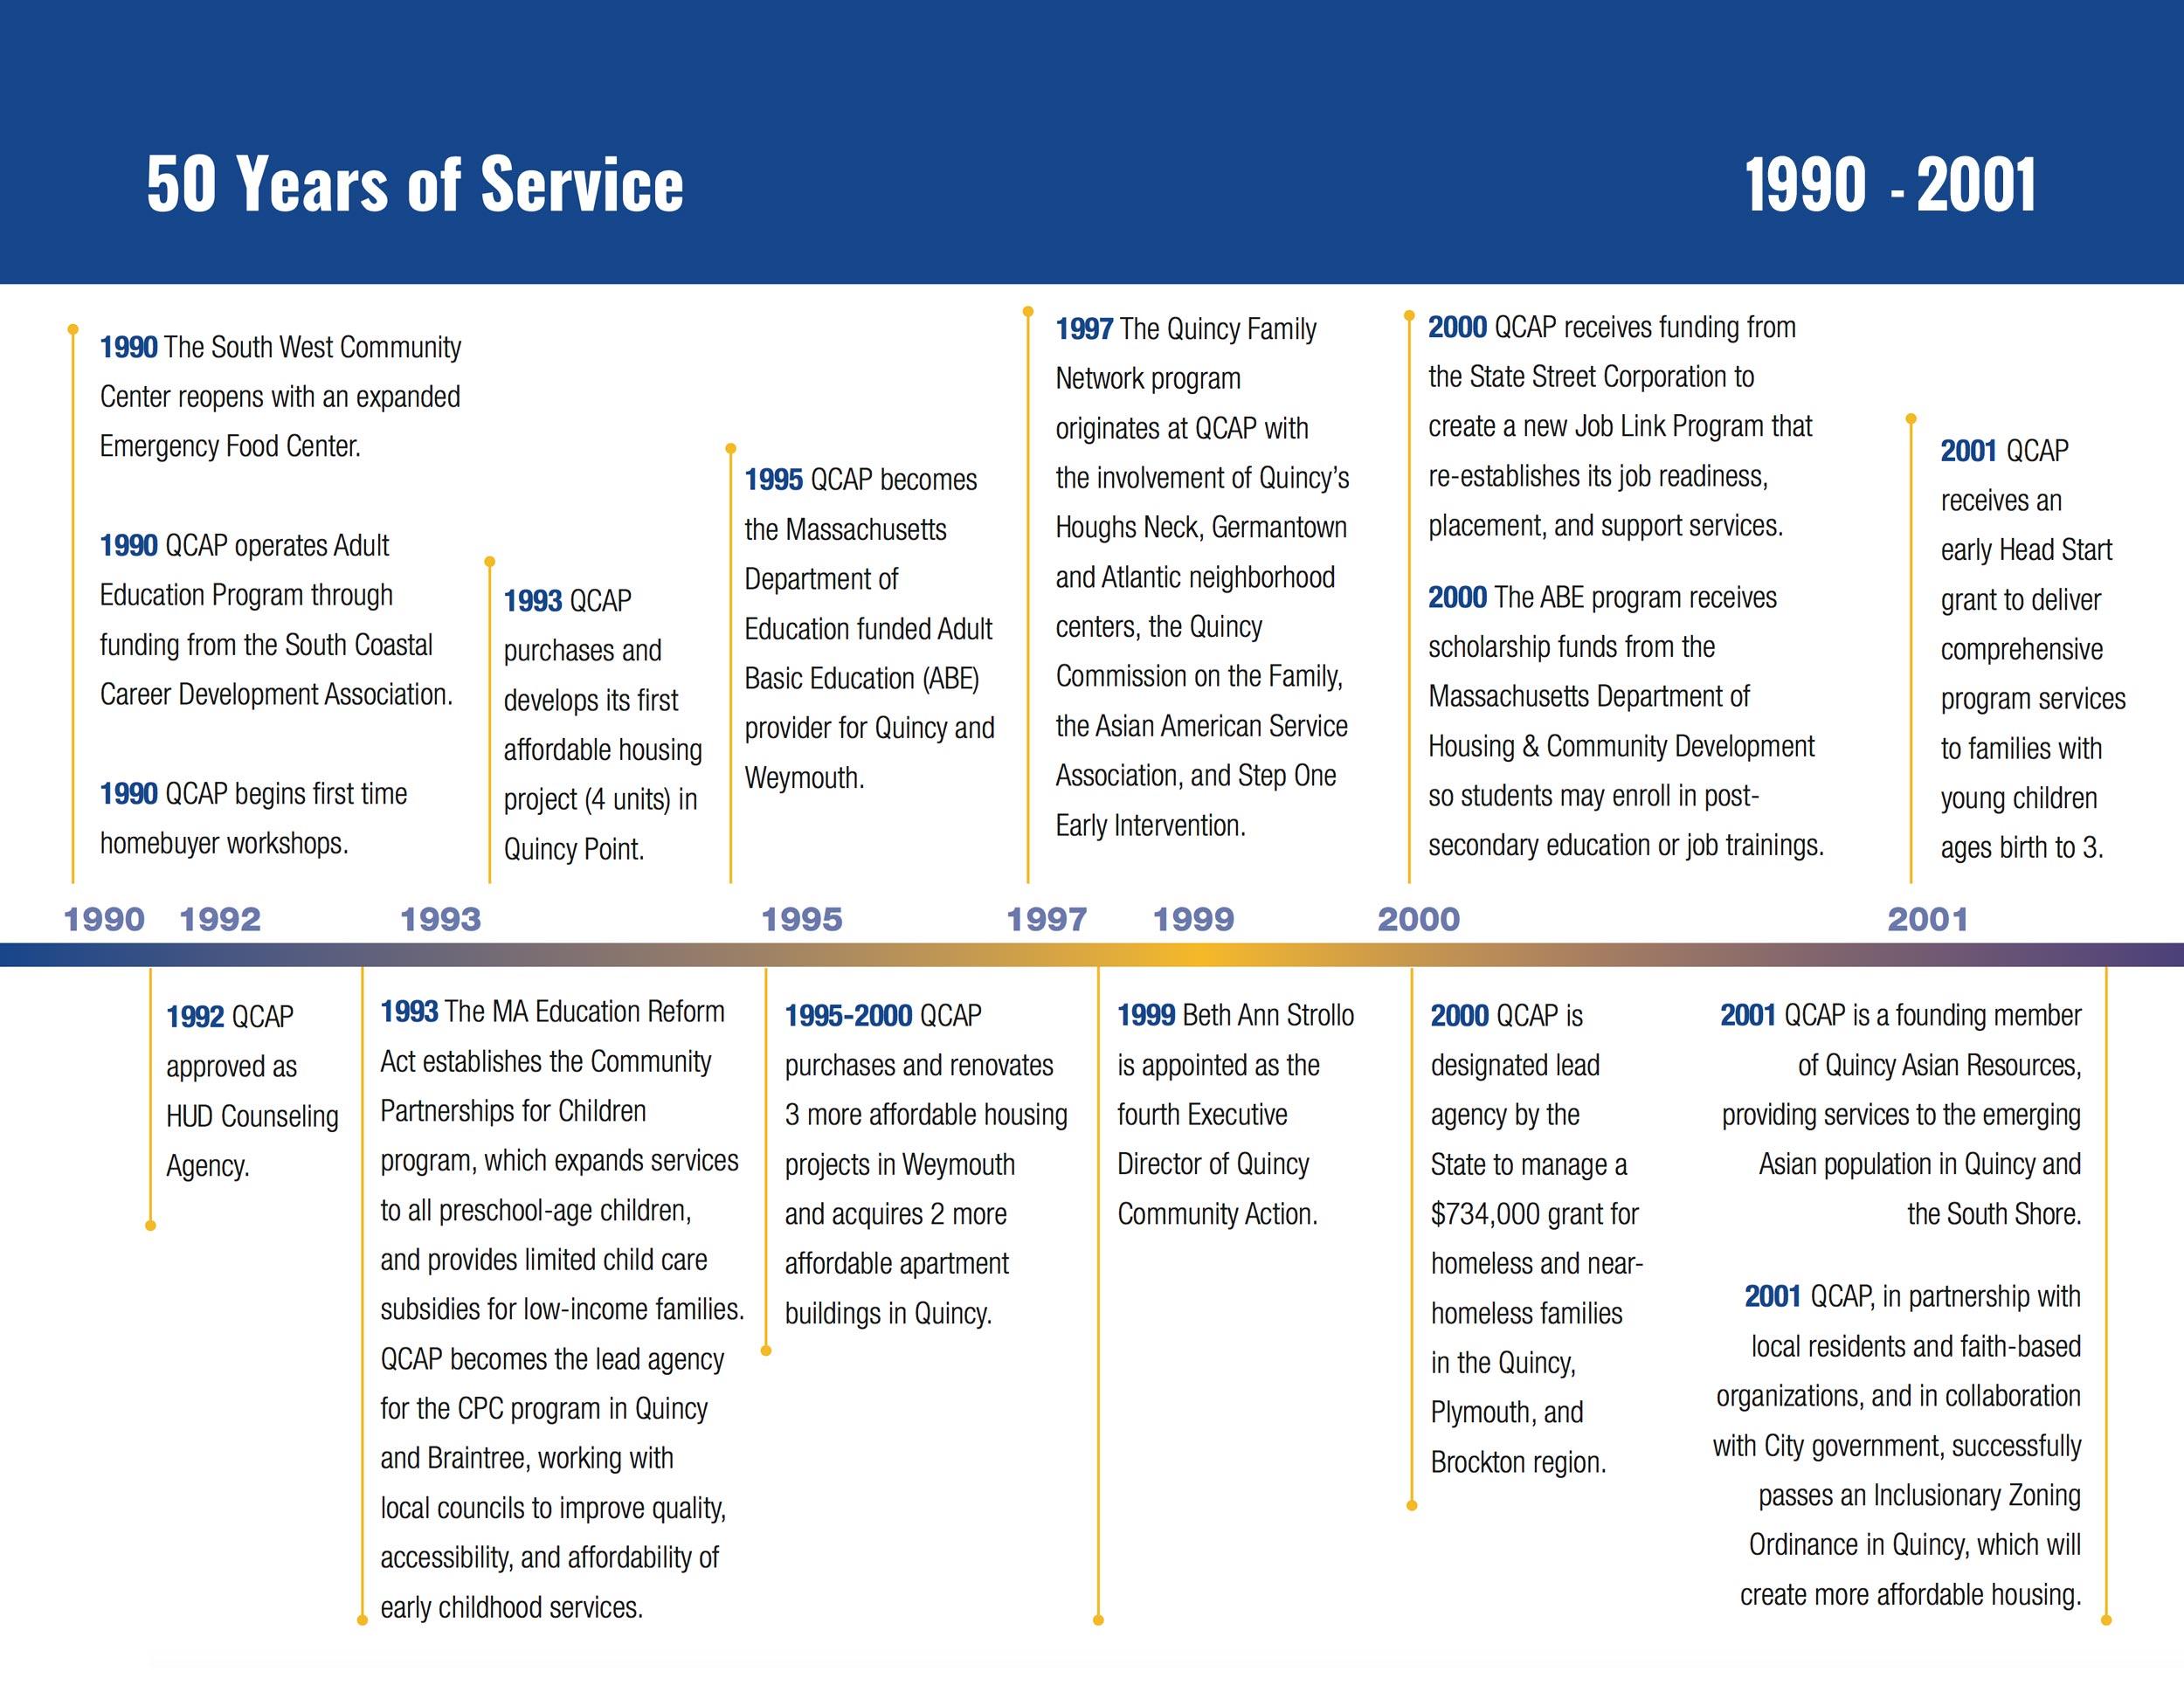 1990 - 2001